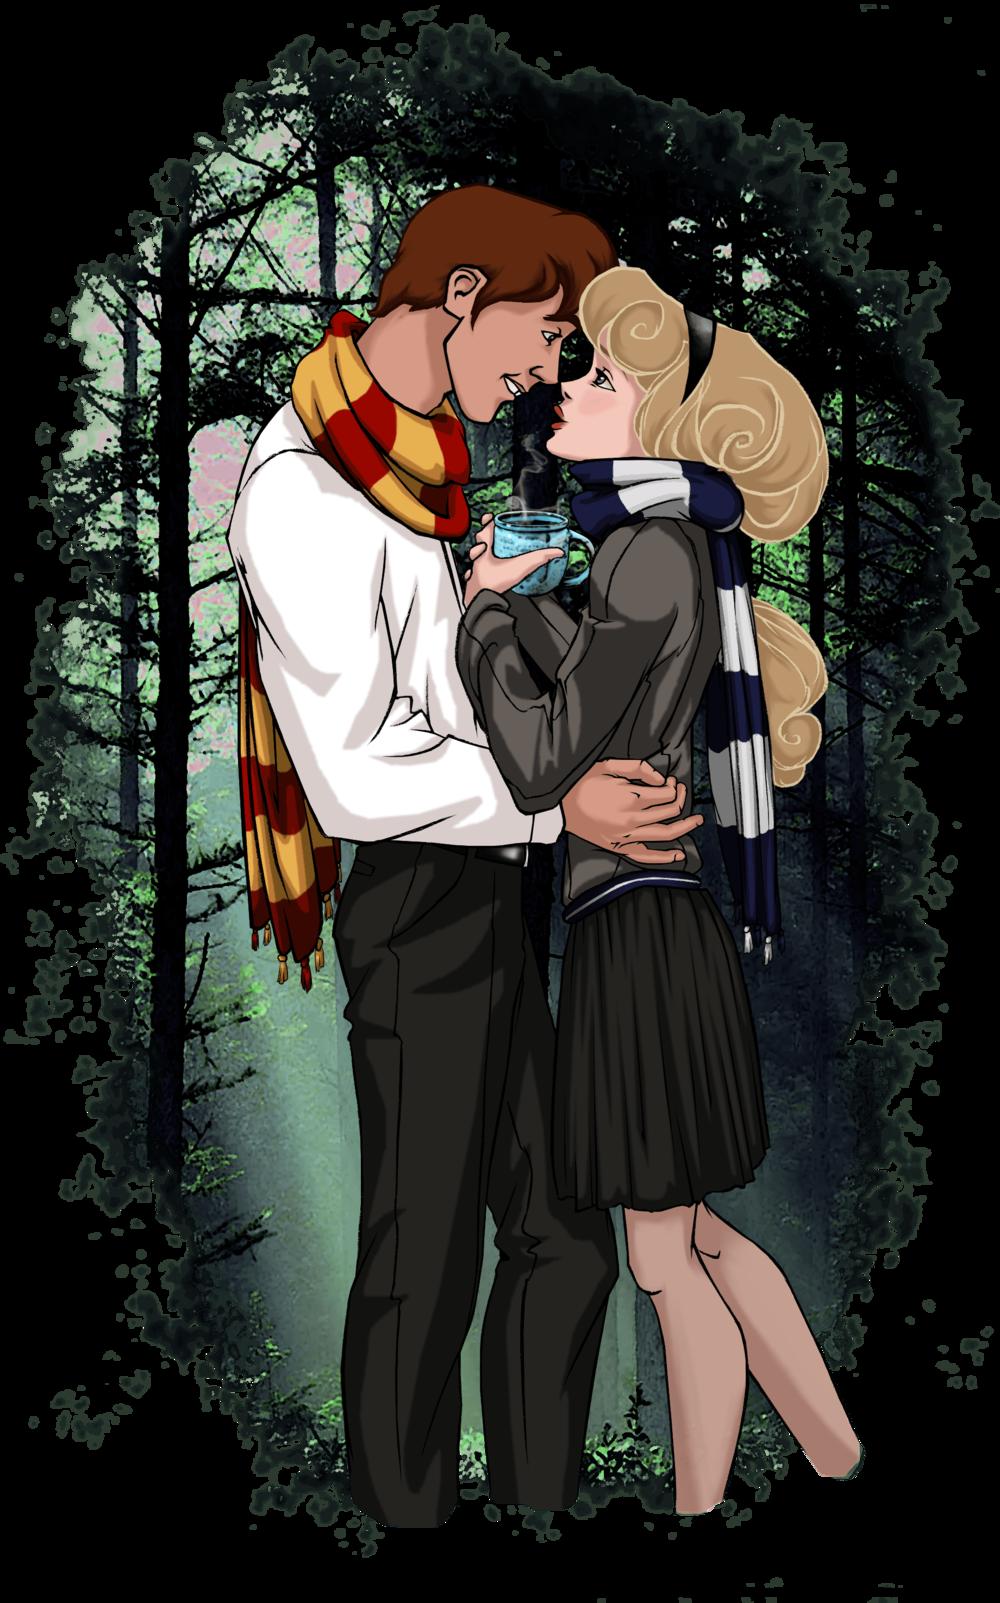 Princess Aurora and Prince Phillip